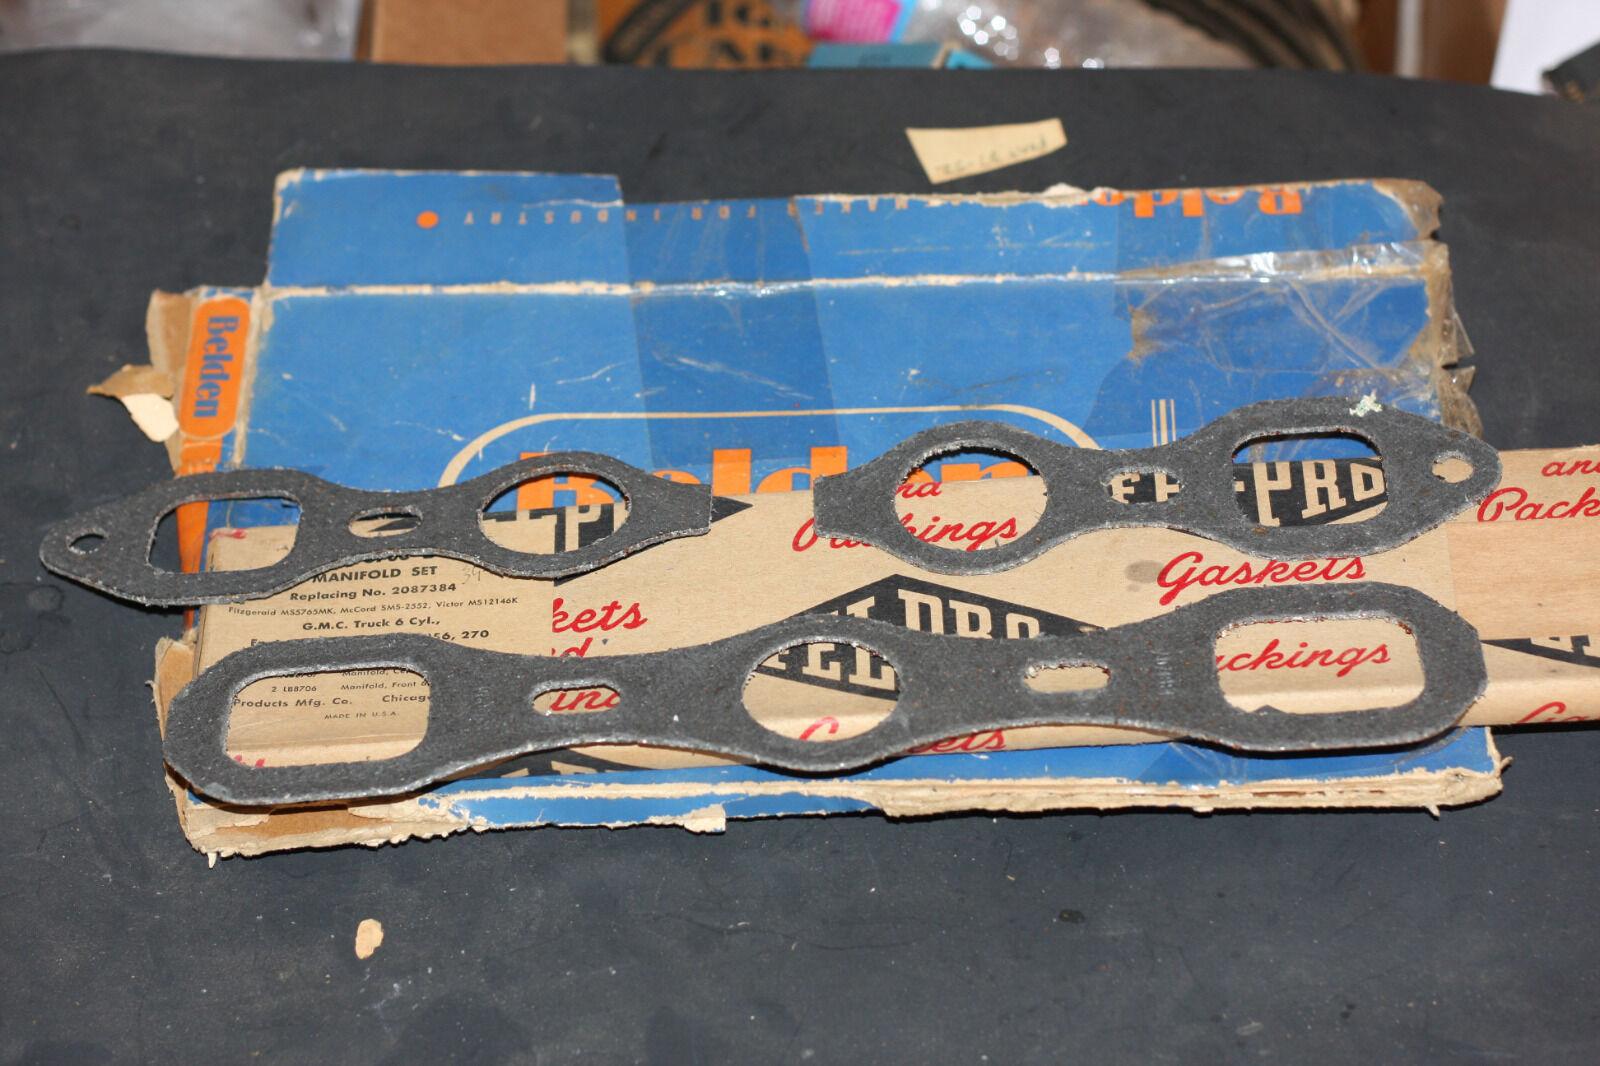 1939,1940,1941,1942,1946,1947,1948,1949,1950,1951,1952 Chevrolet Manifold Switch